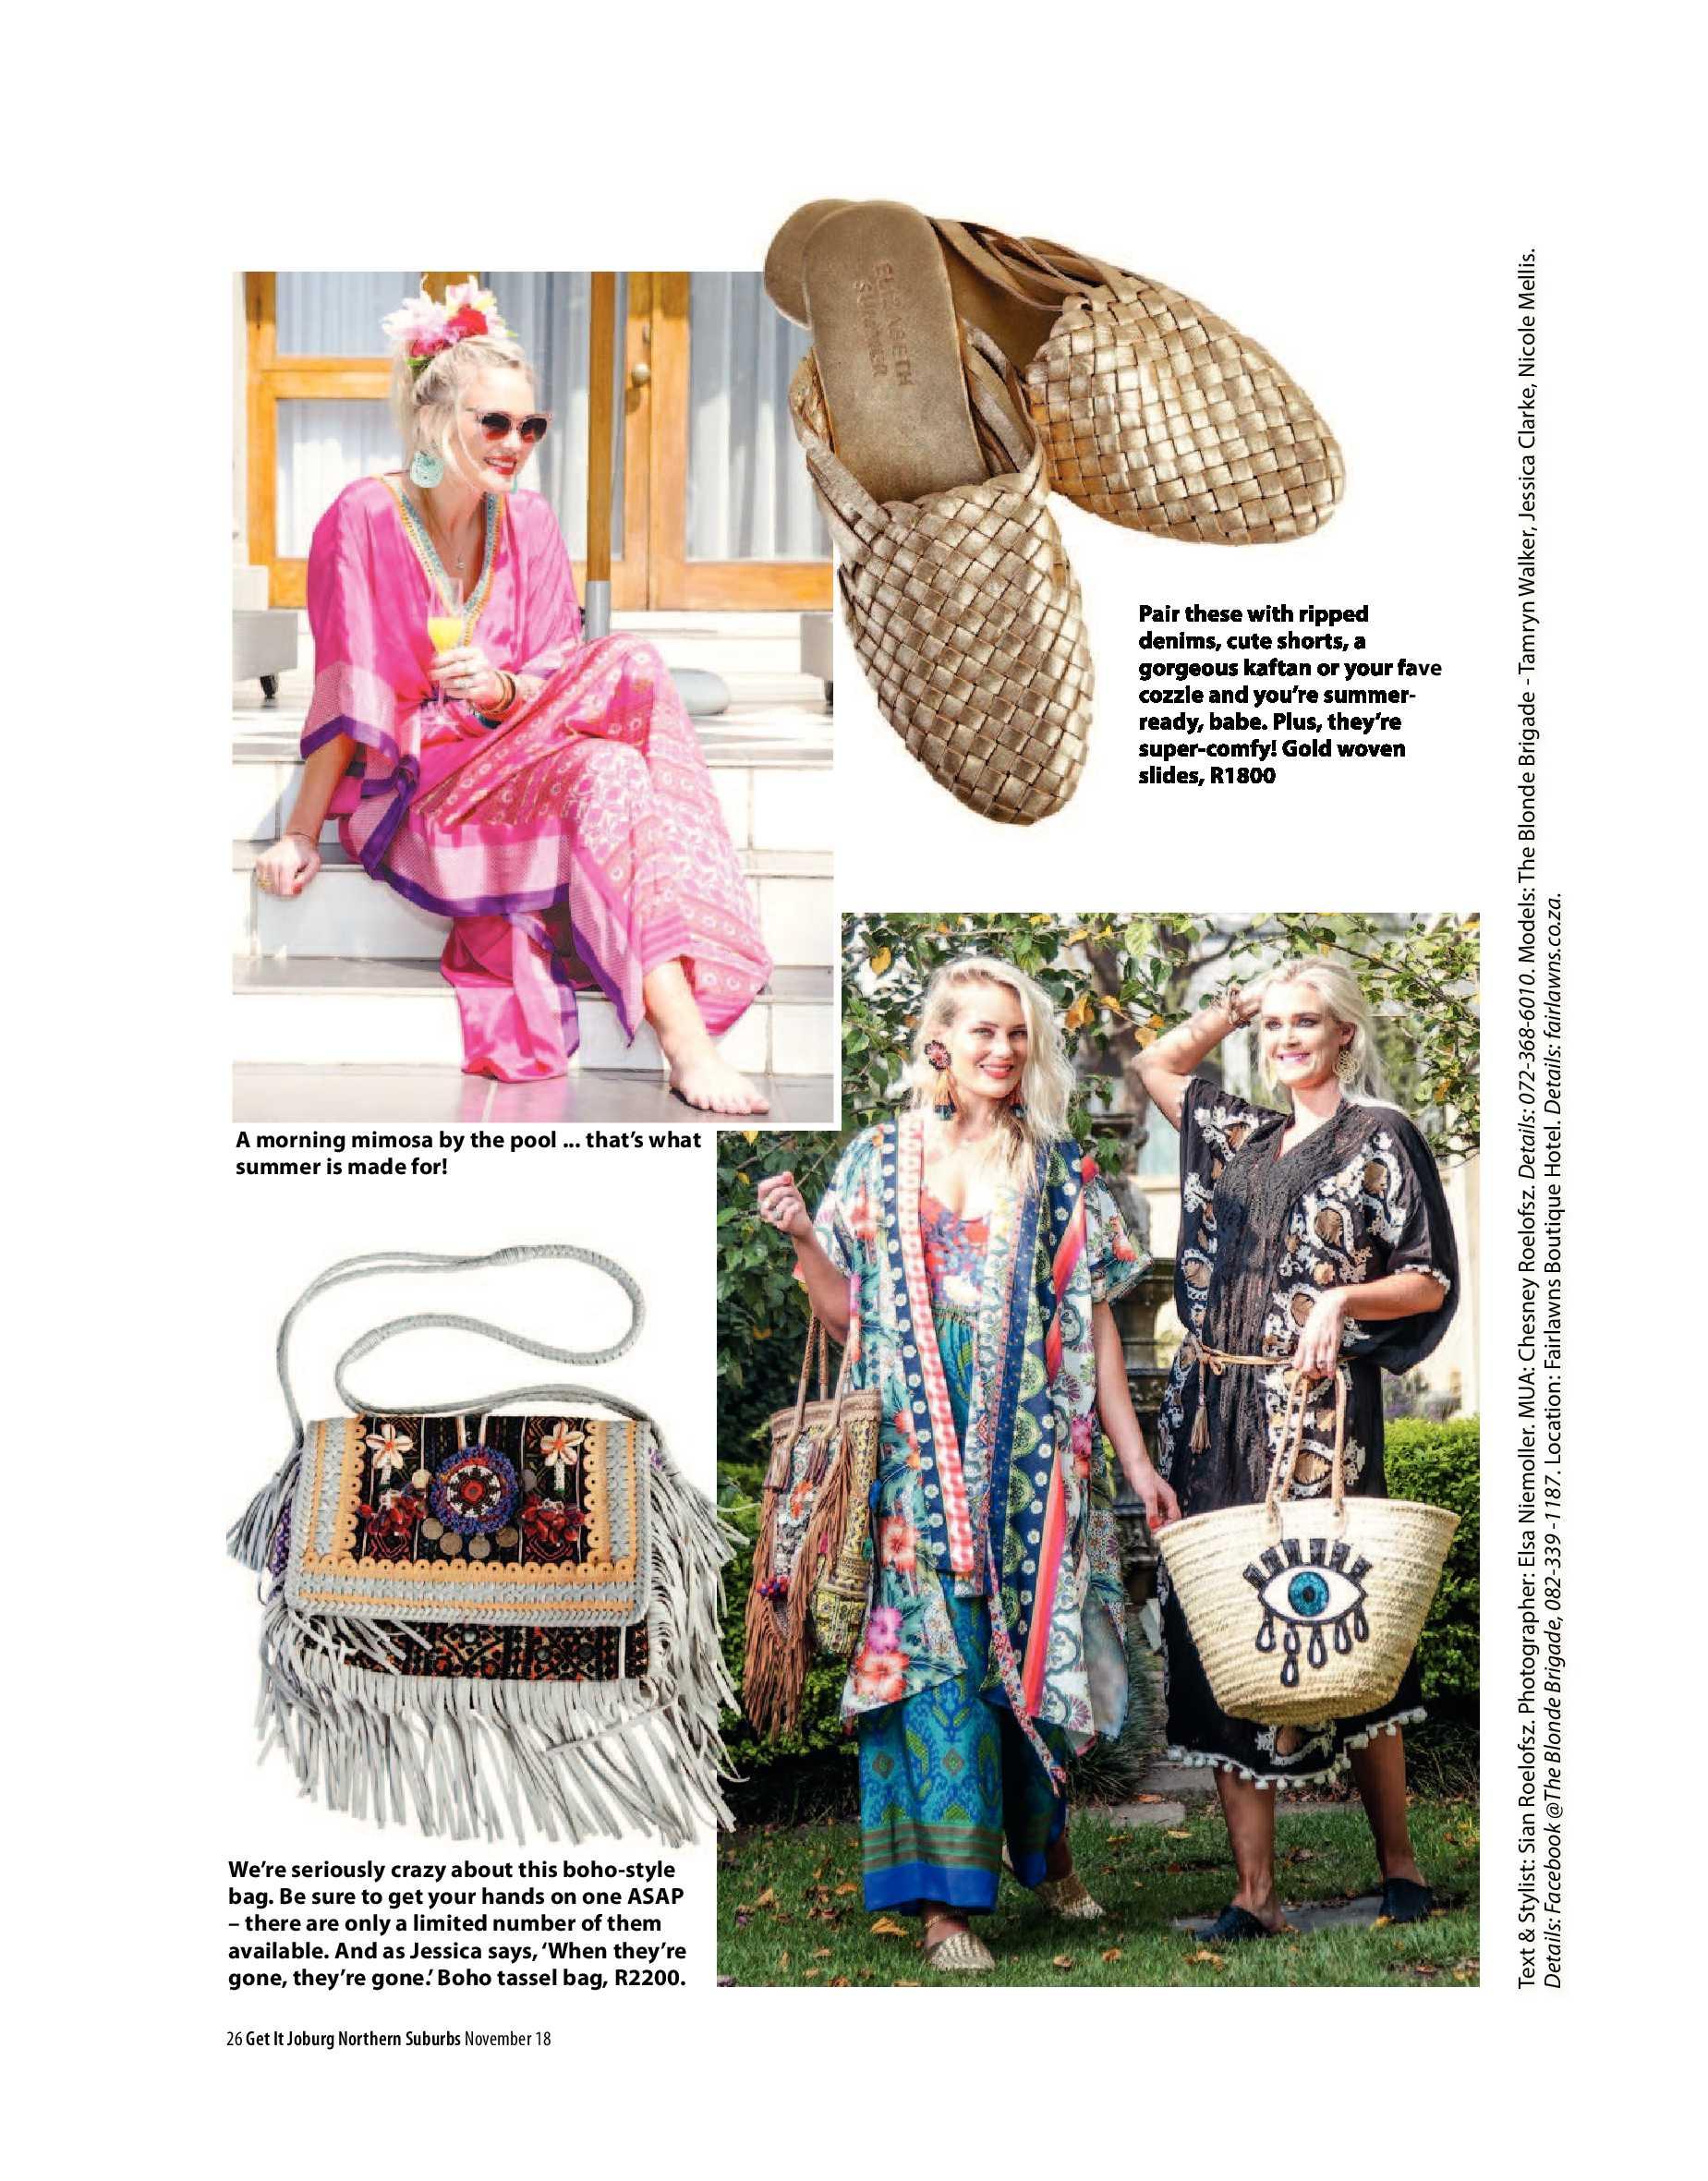 get-joburg-north-november-2018-epapers-page-26